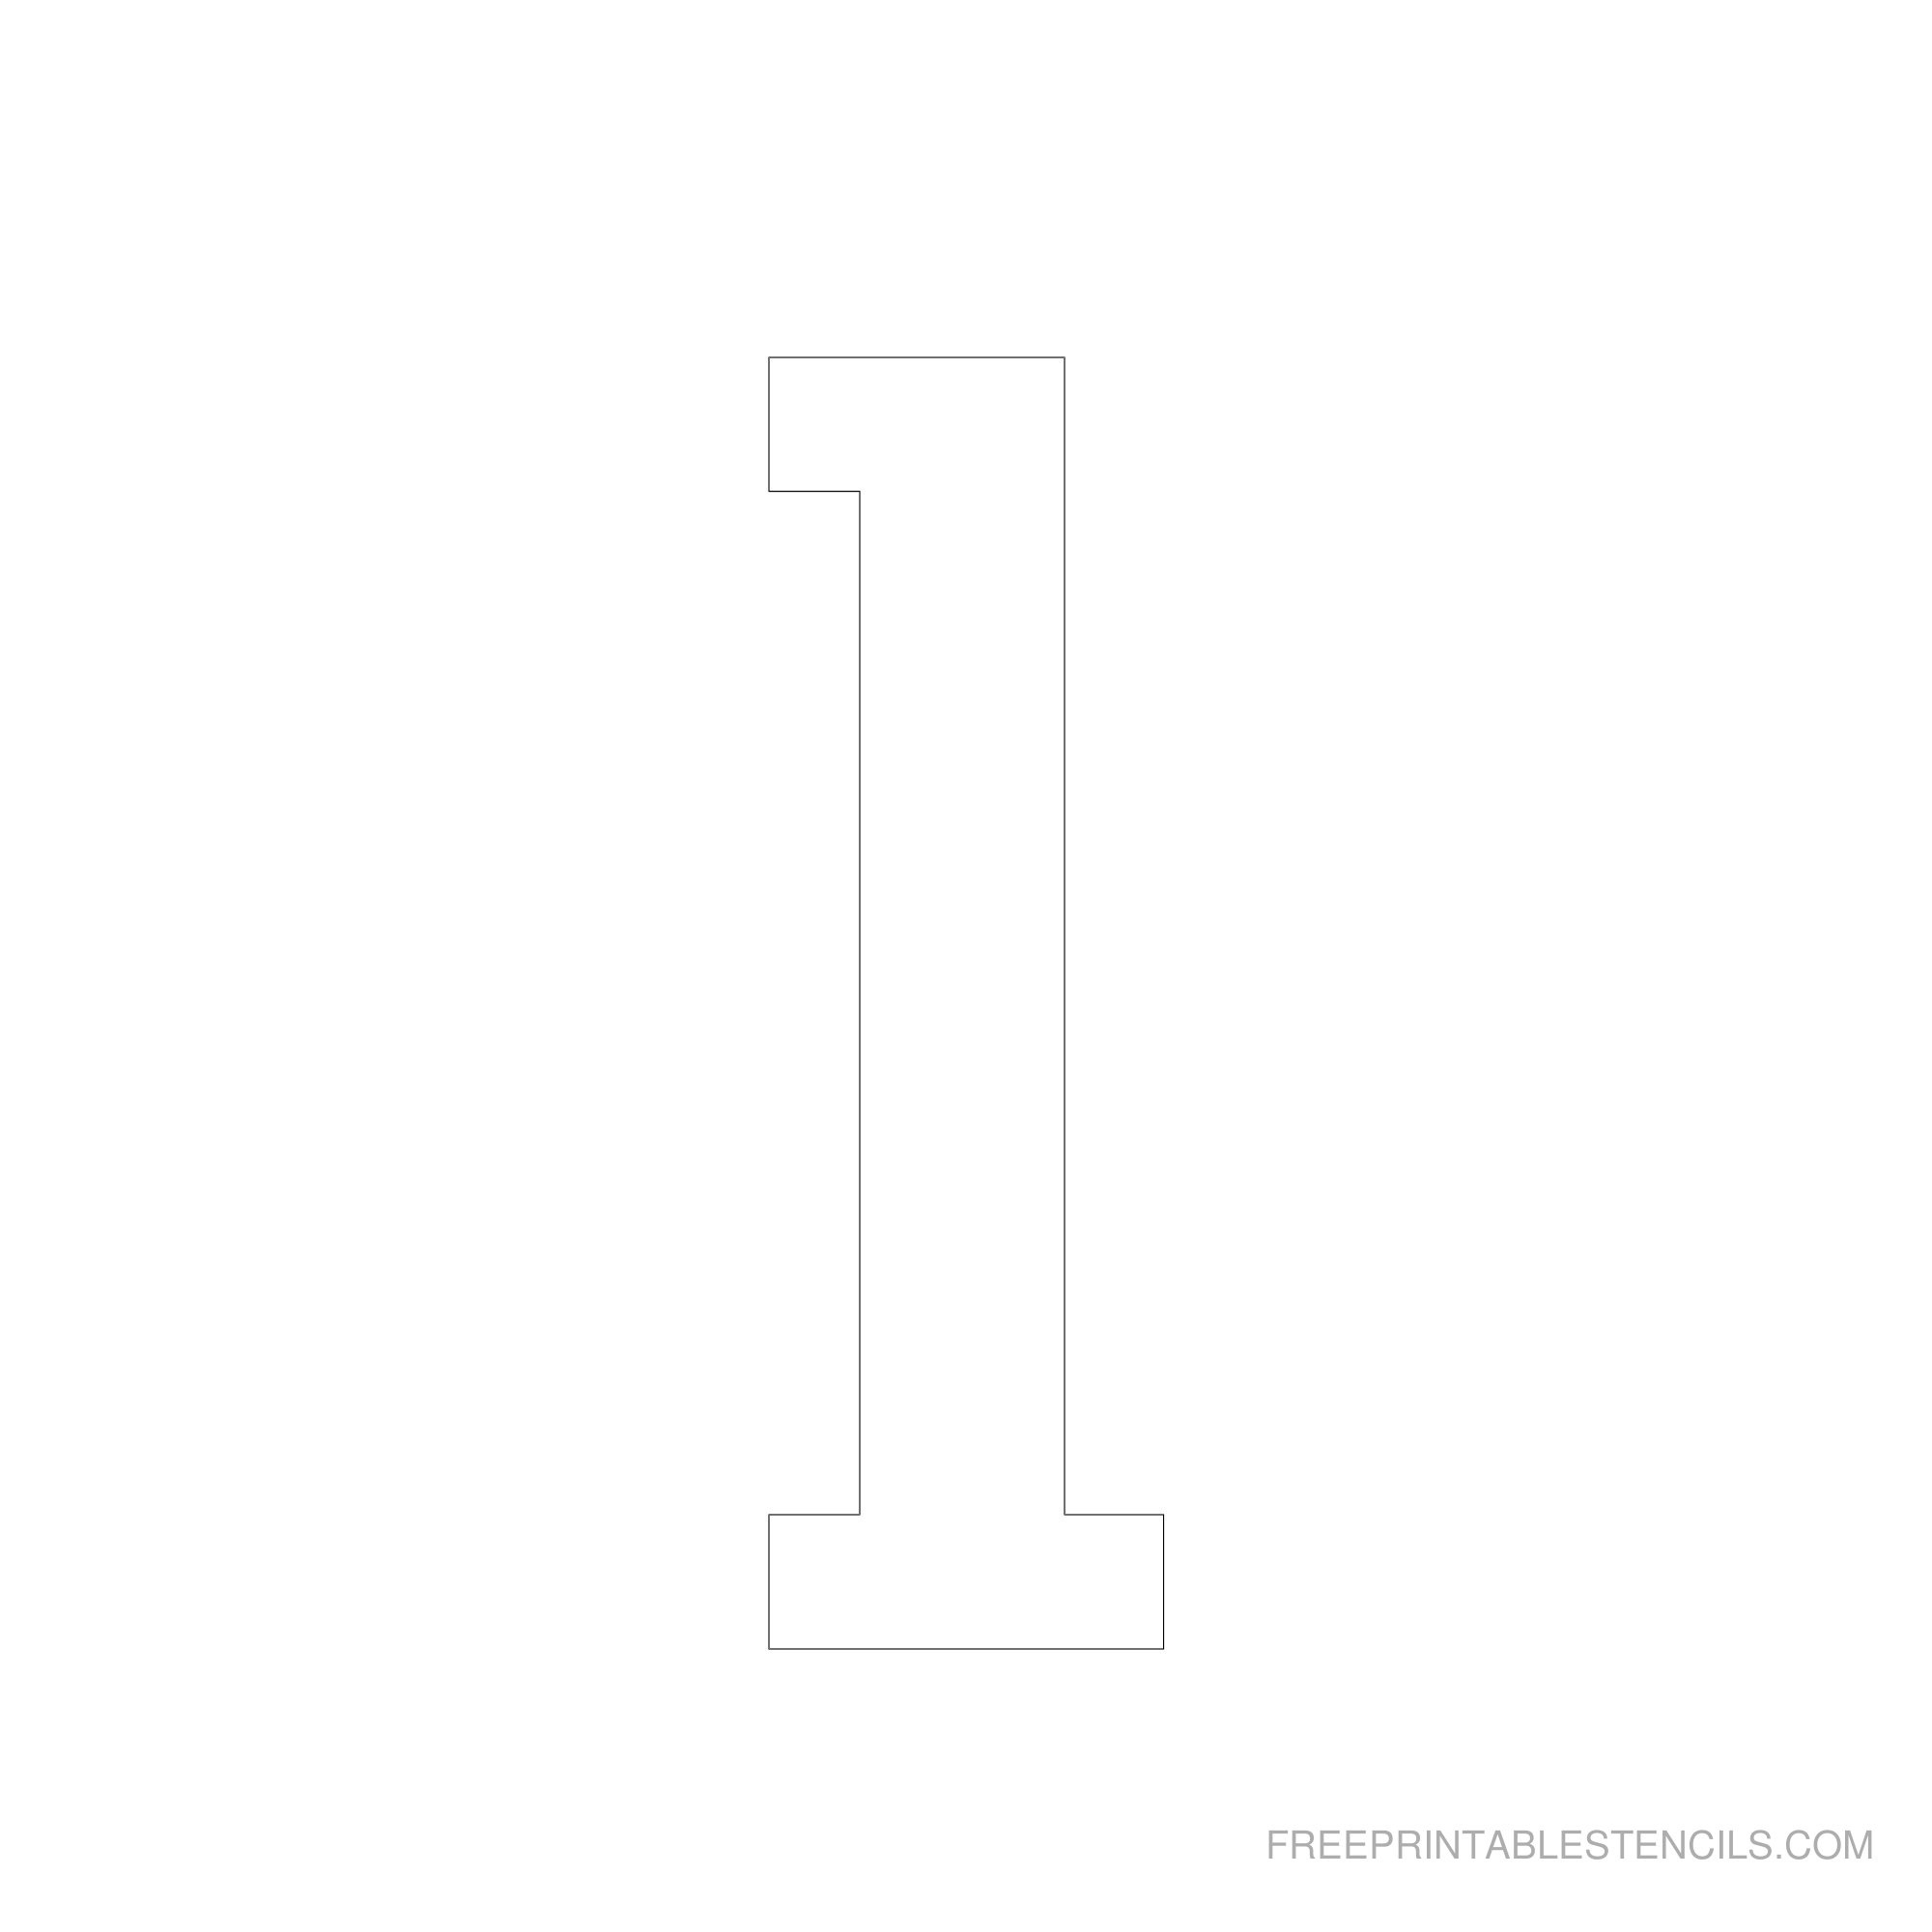 Printable 6 Inch Number Stencils 1-10 | Free Printable Stencils - Free Printable 5 Inch Number Stencils